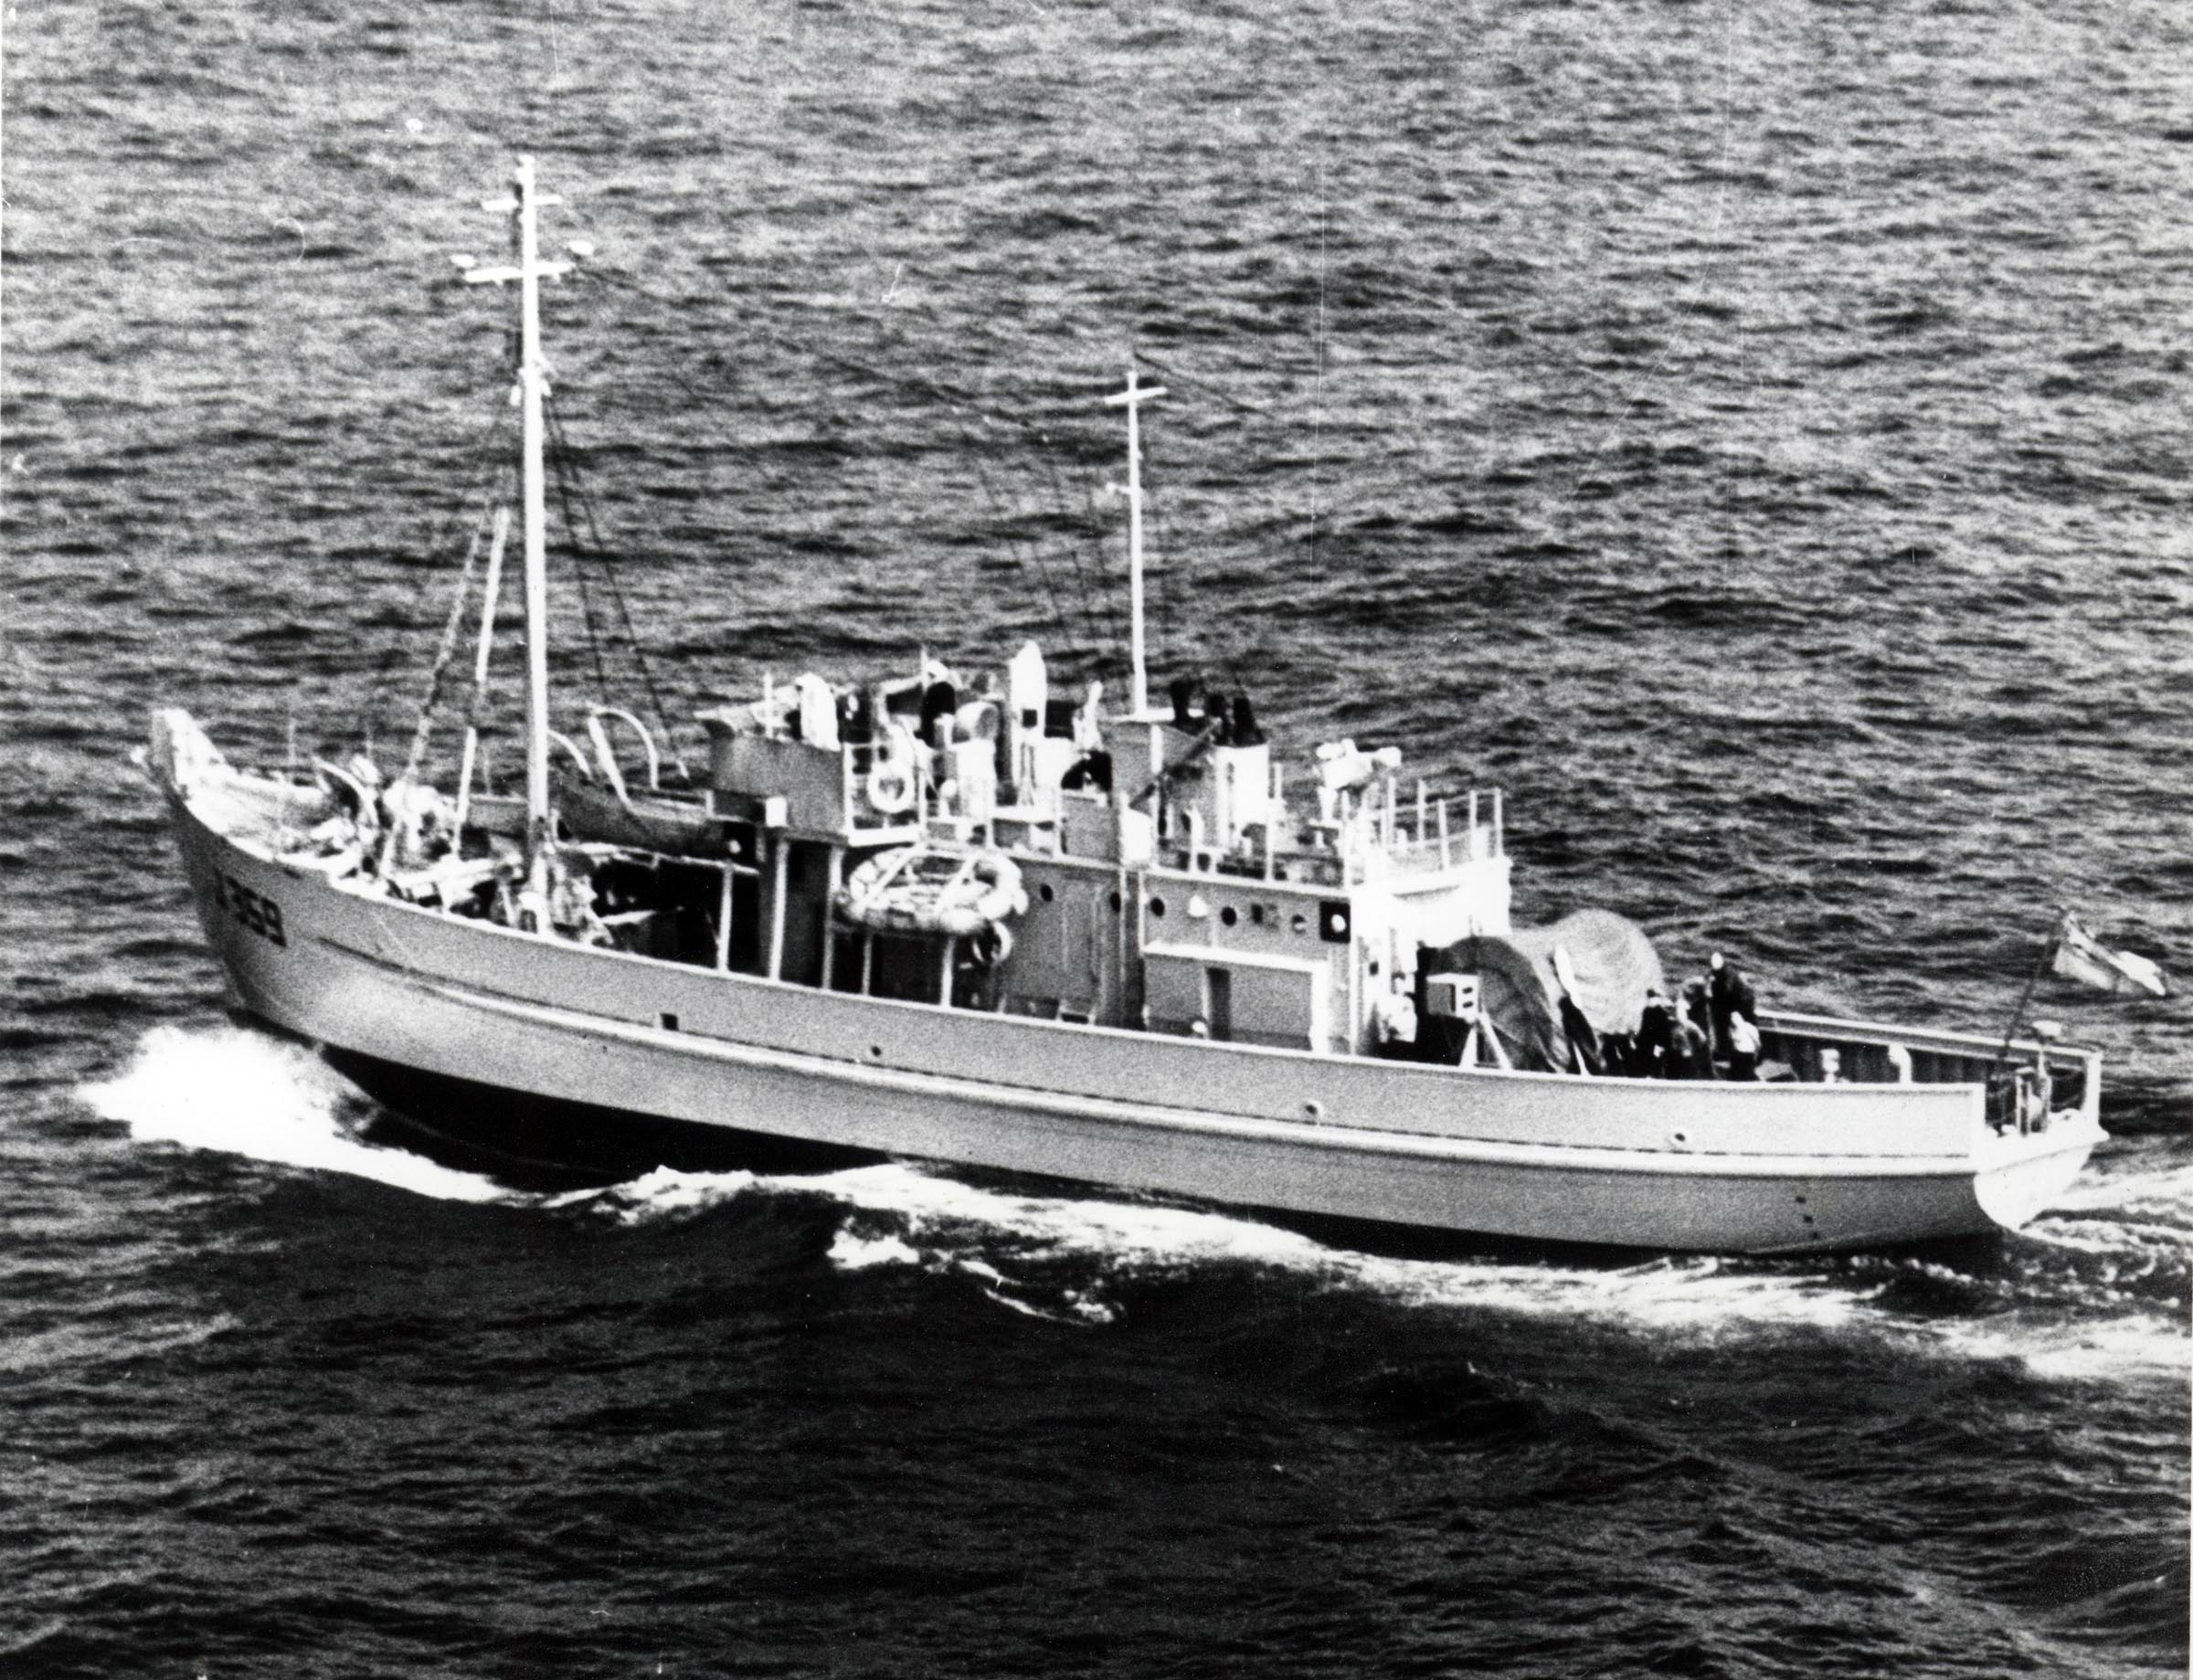 HMCS ST. JOSEPH